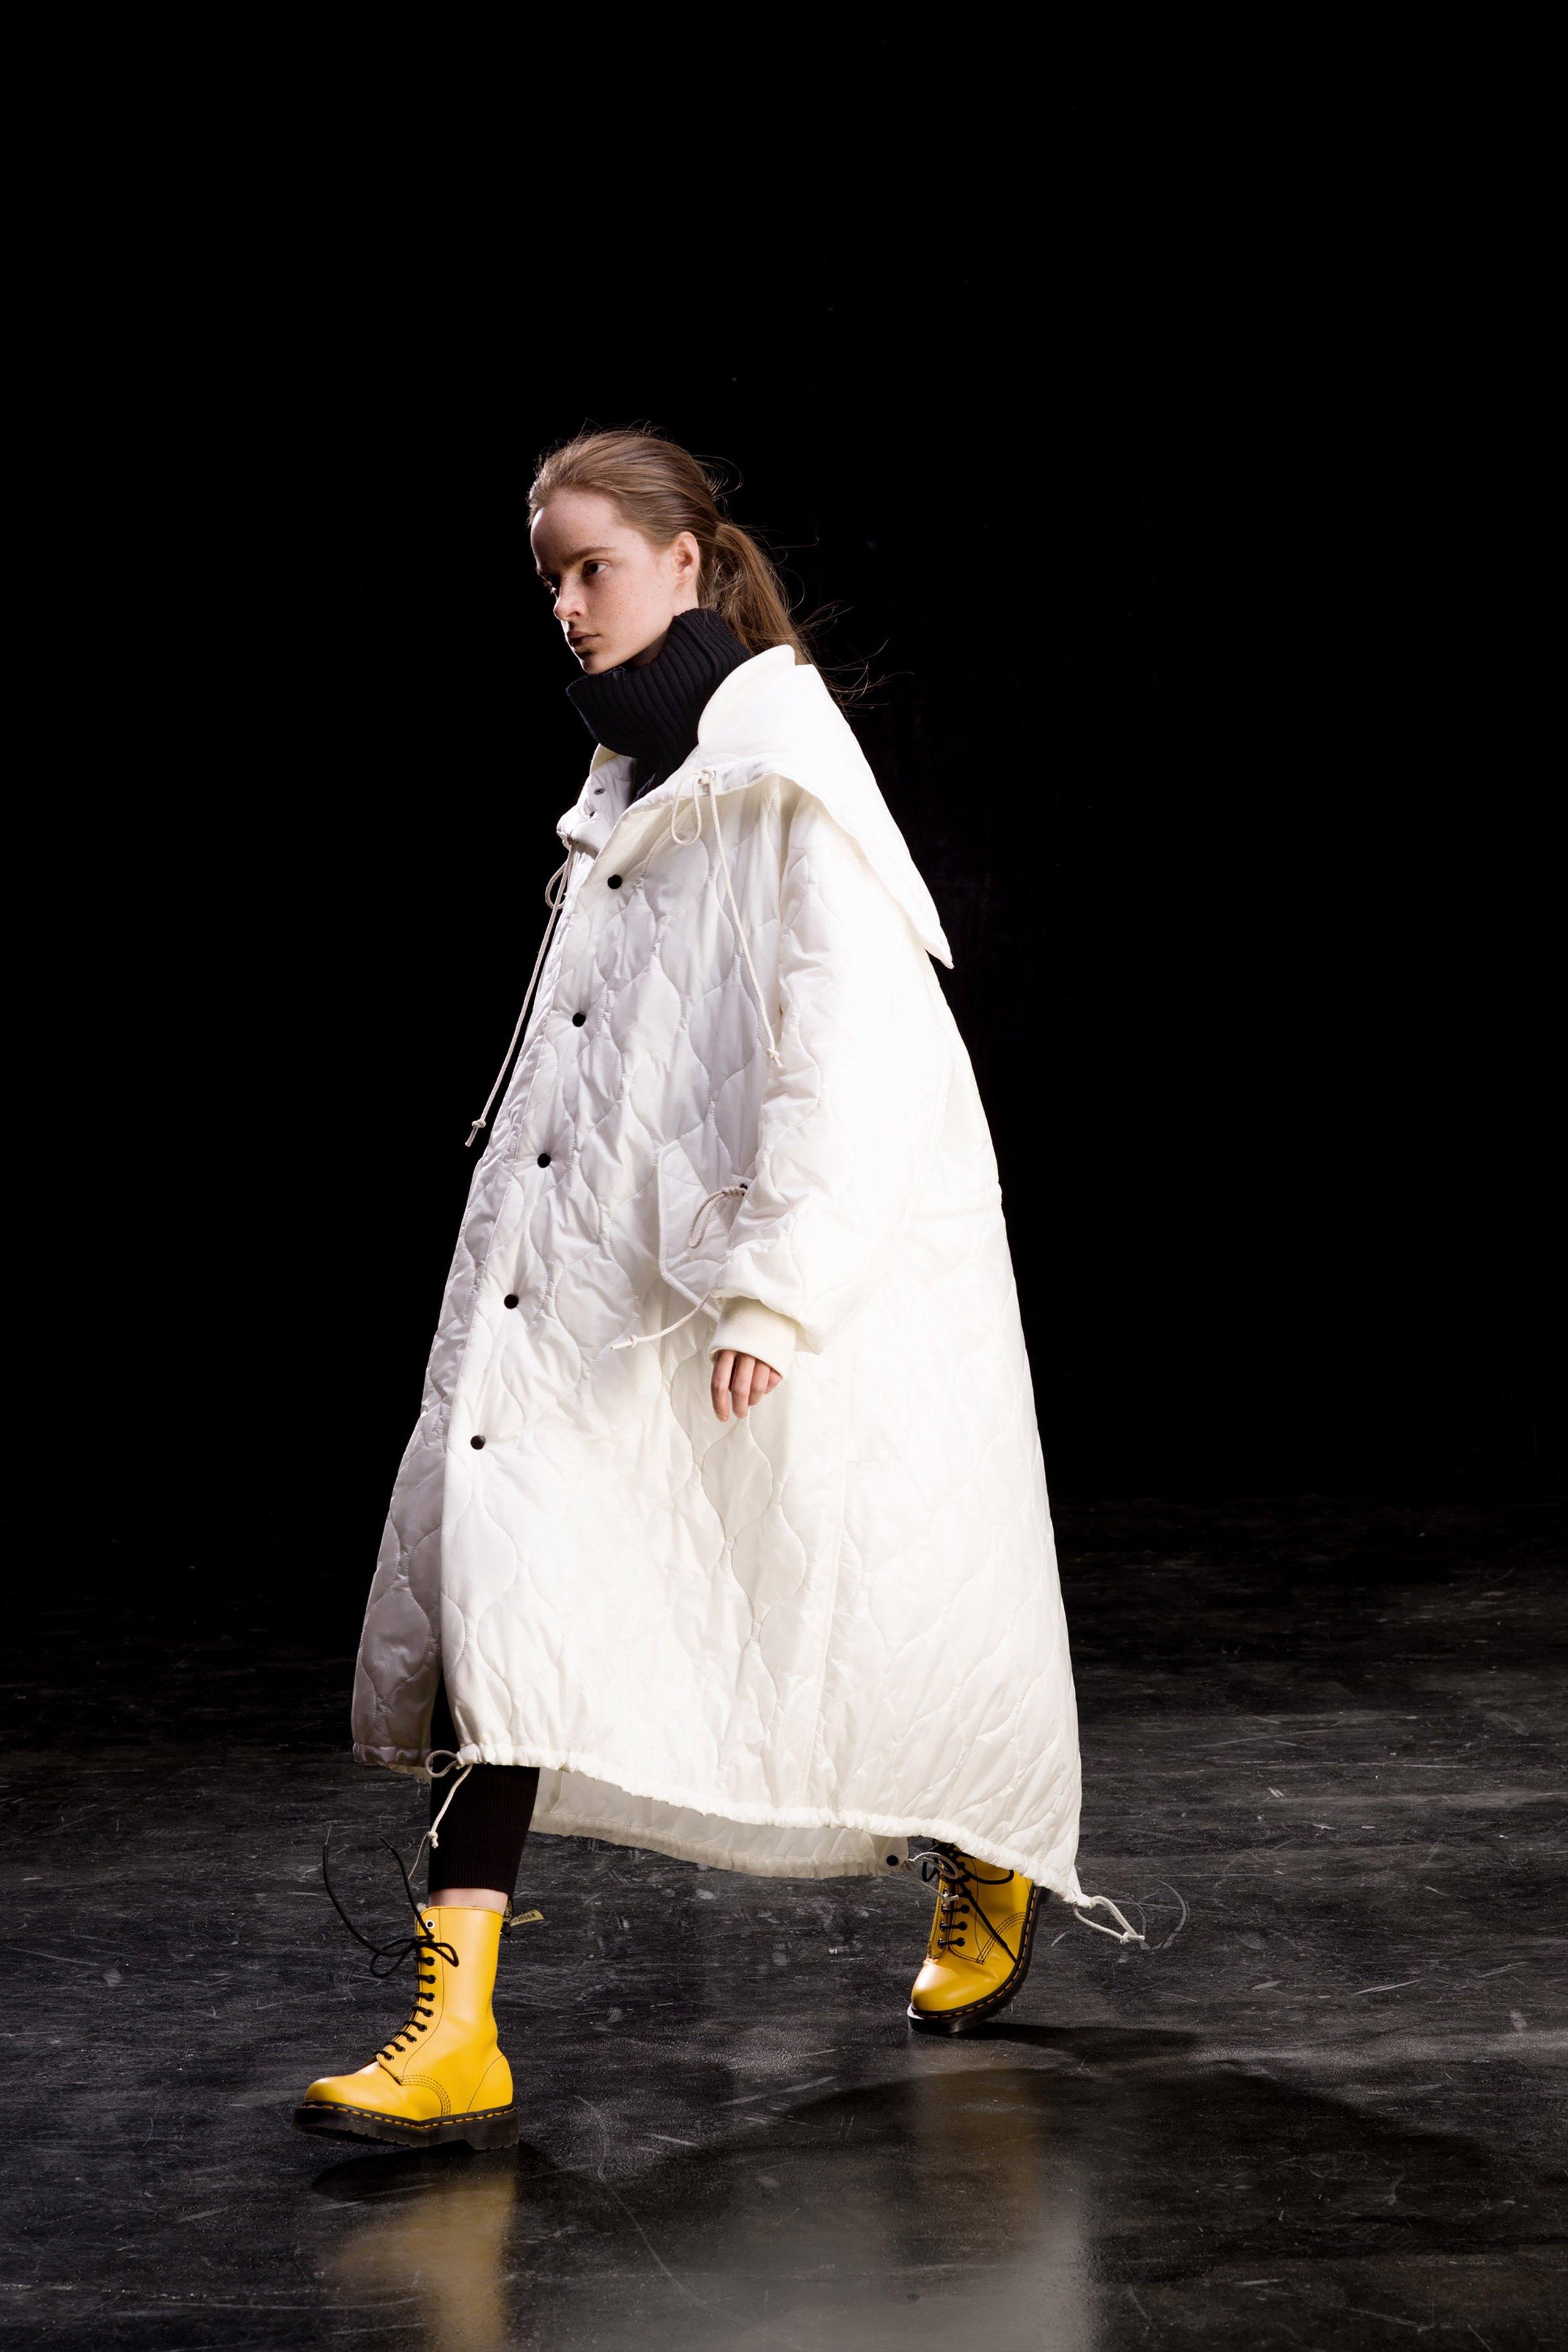 00033-Ys-Yohji-Yamamoto-FALL-19-Ready-To-Wear.jpg